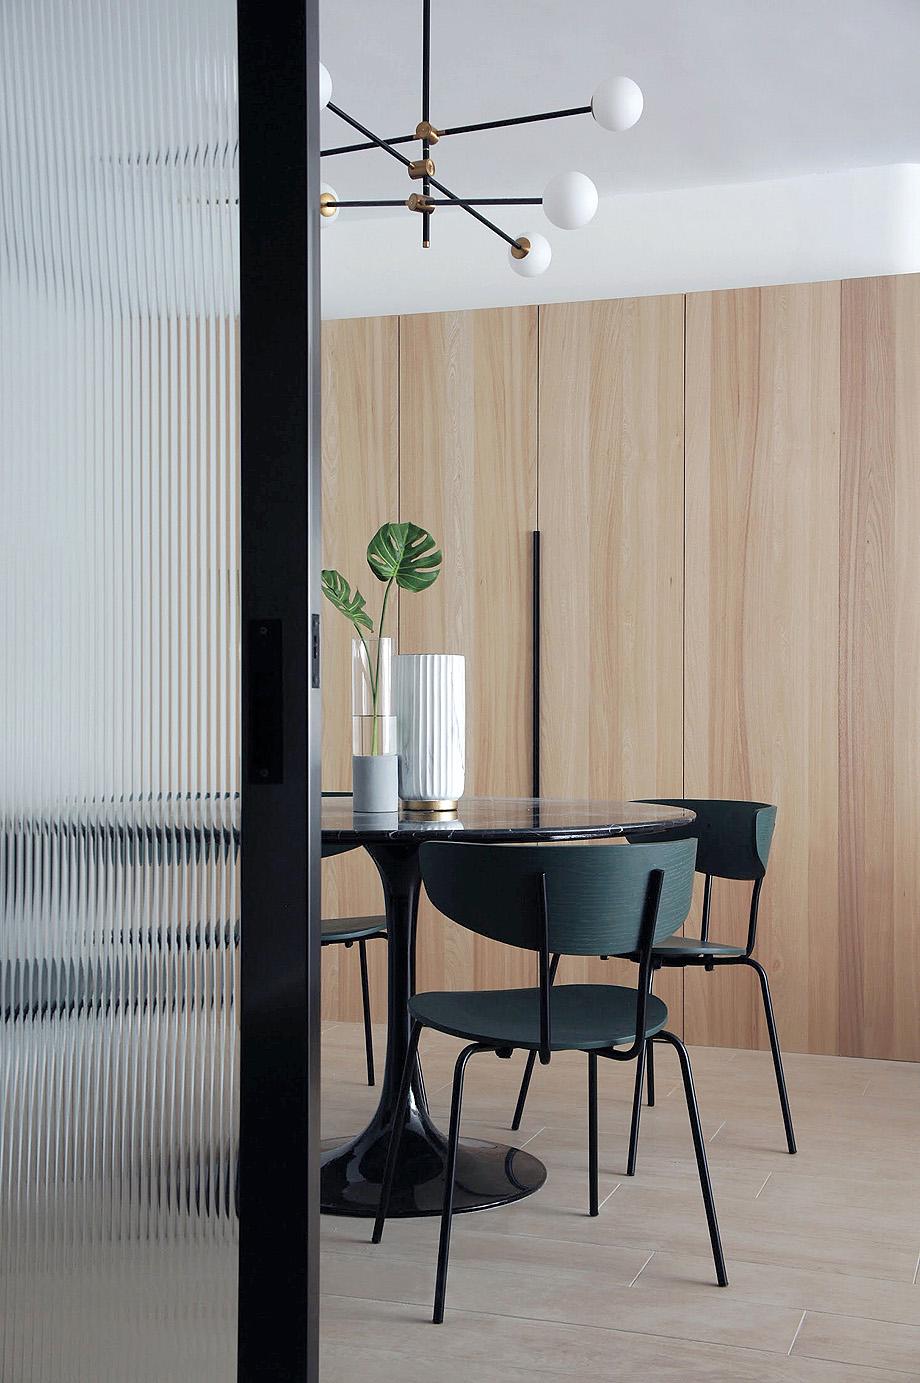 apartamento en hong kong de human w design - foto human w design (5)